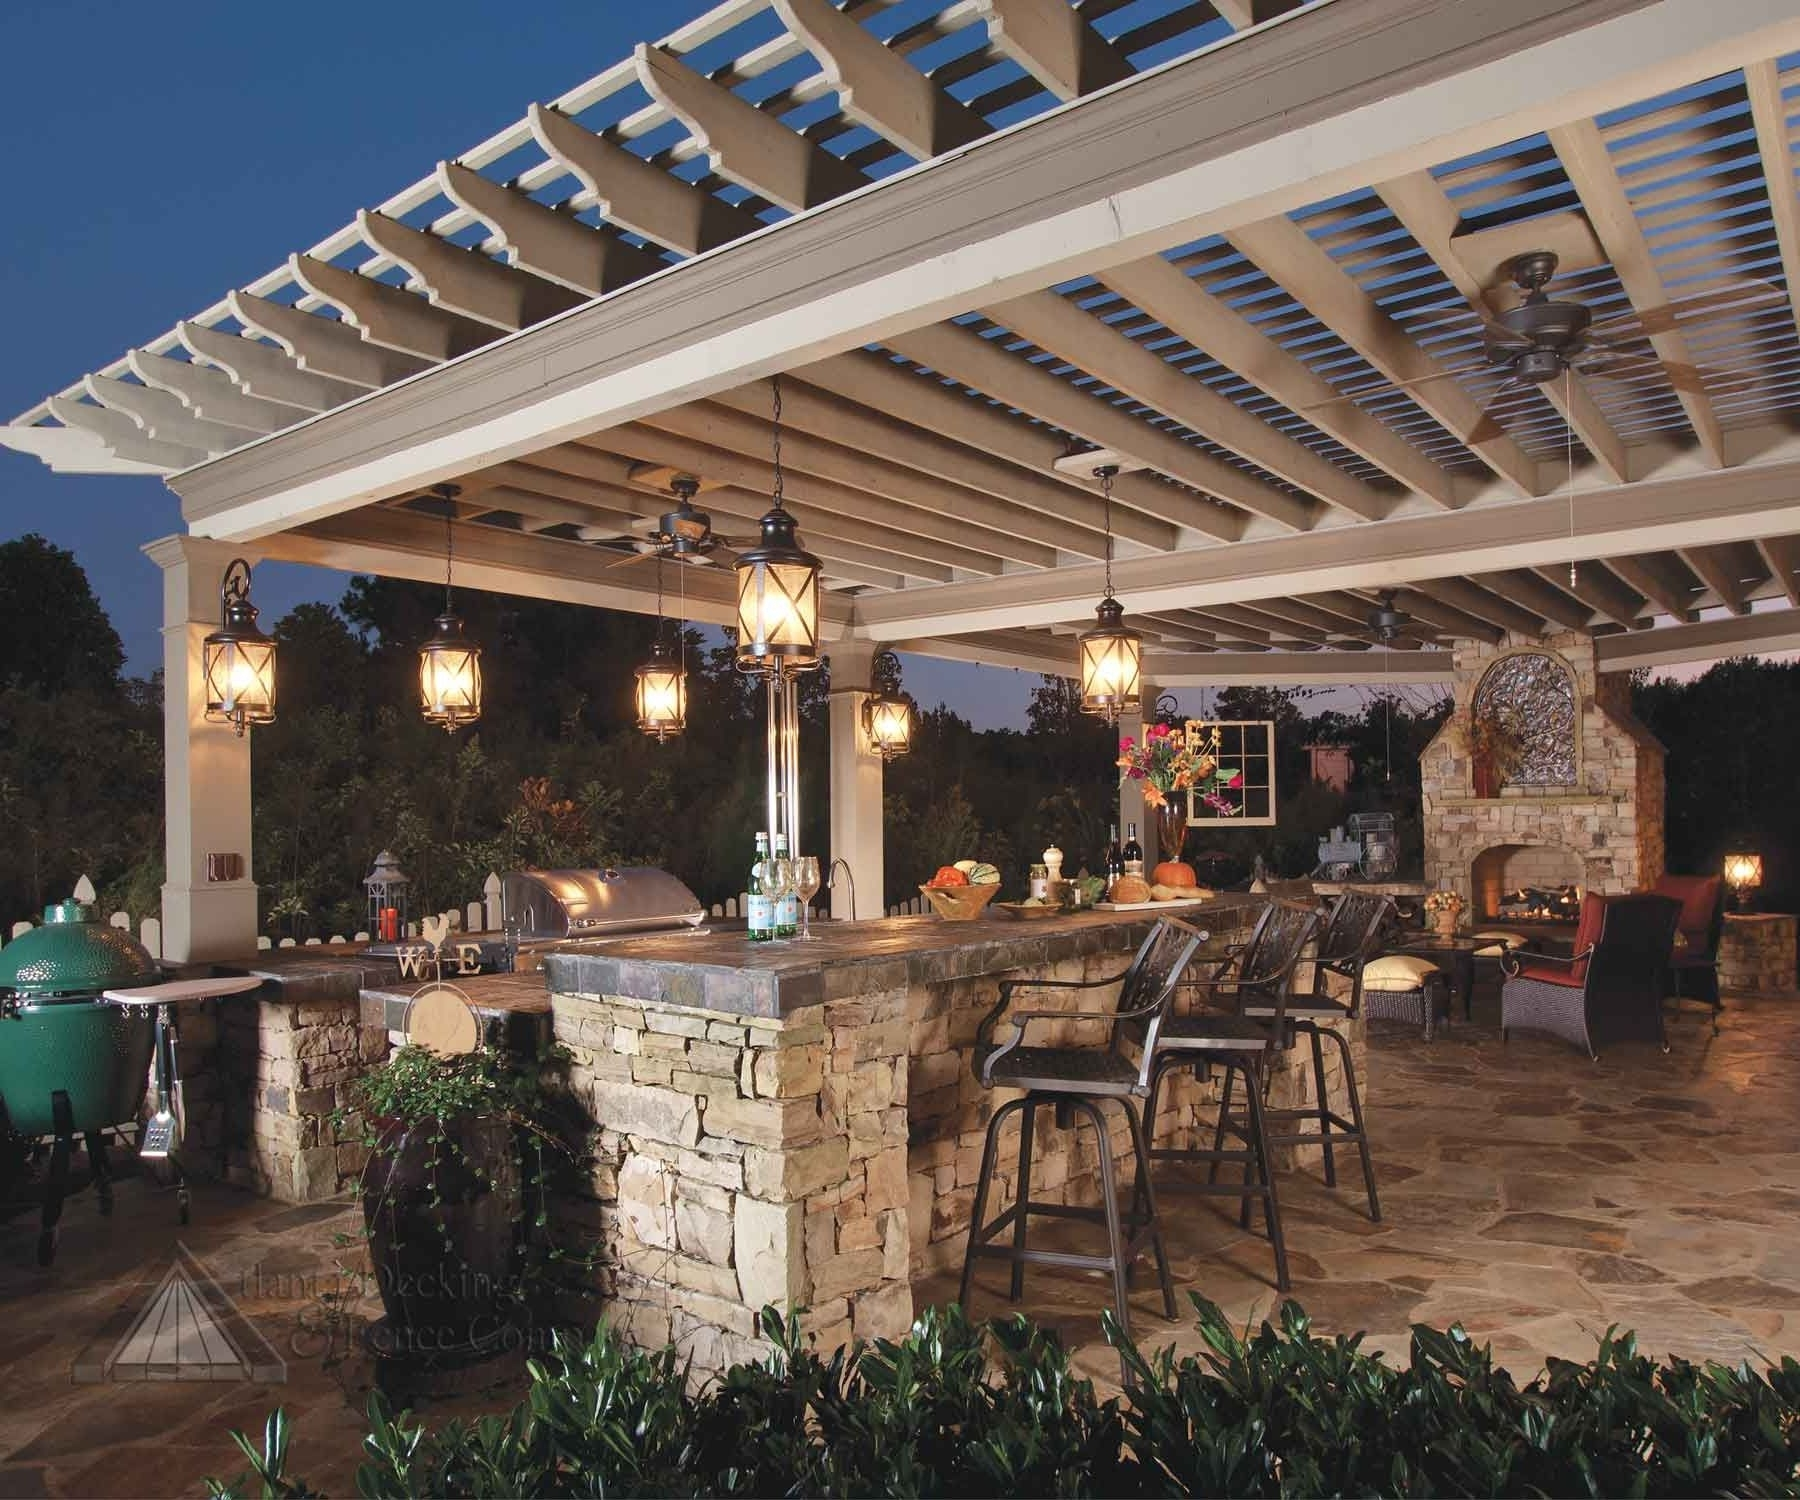 Wayfair Outdoor Hanging Lighting Fixtures For Most Current Gorgeous Outdoor Kitchen Lighting Fixtures On House Design Ideas (View 9 of 20)